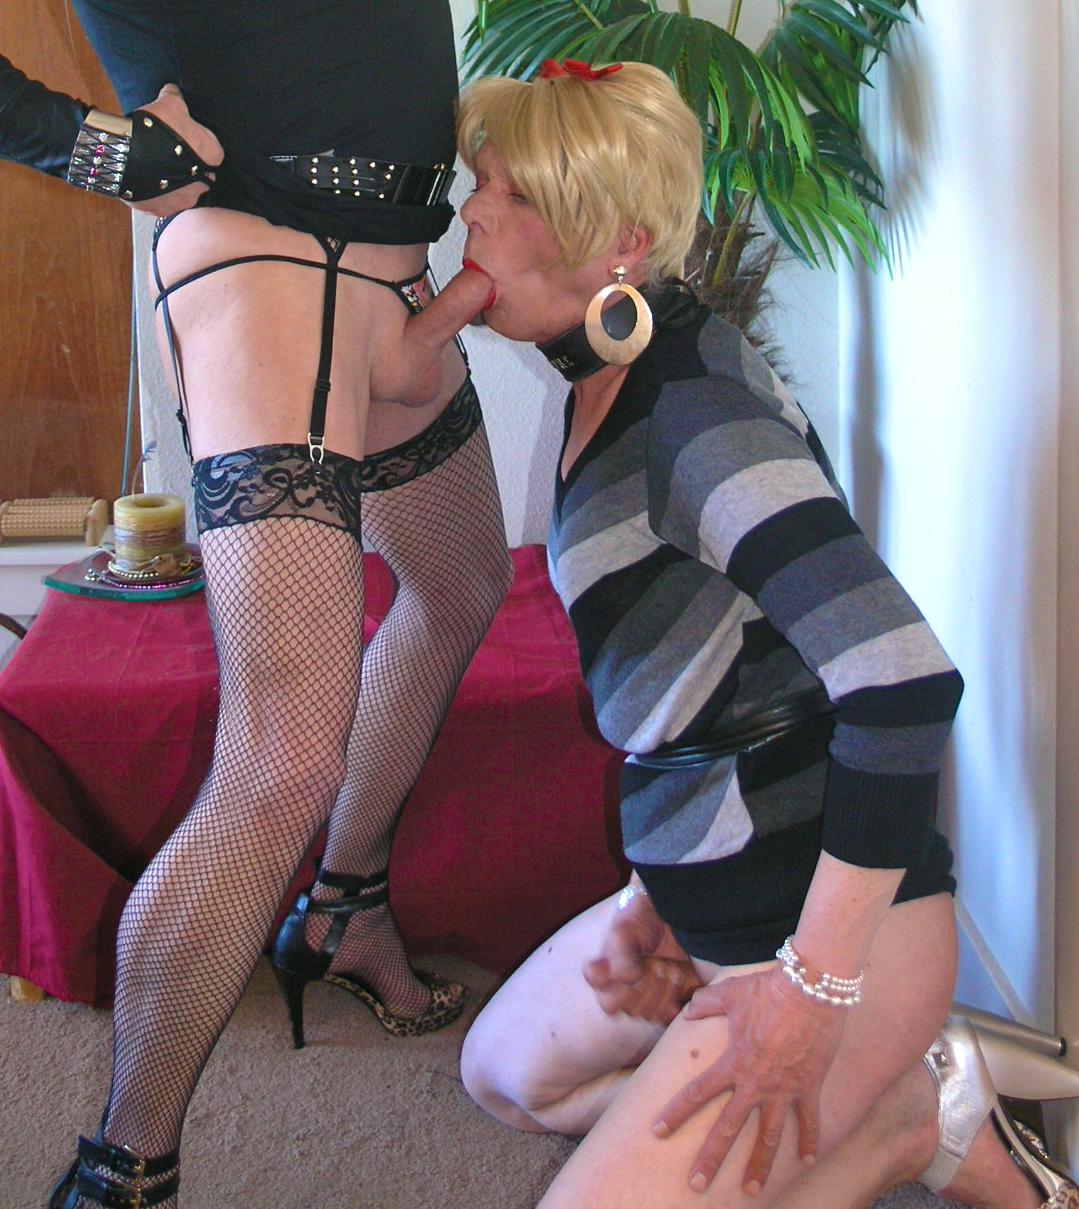 Secret panty wearing sissy is now craving cocks